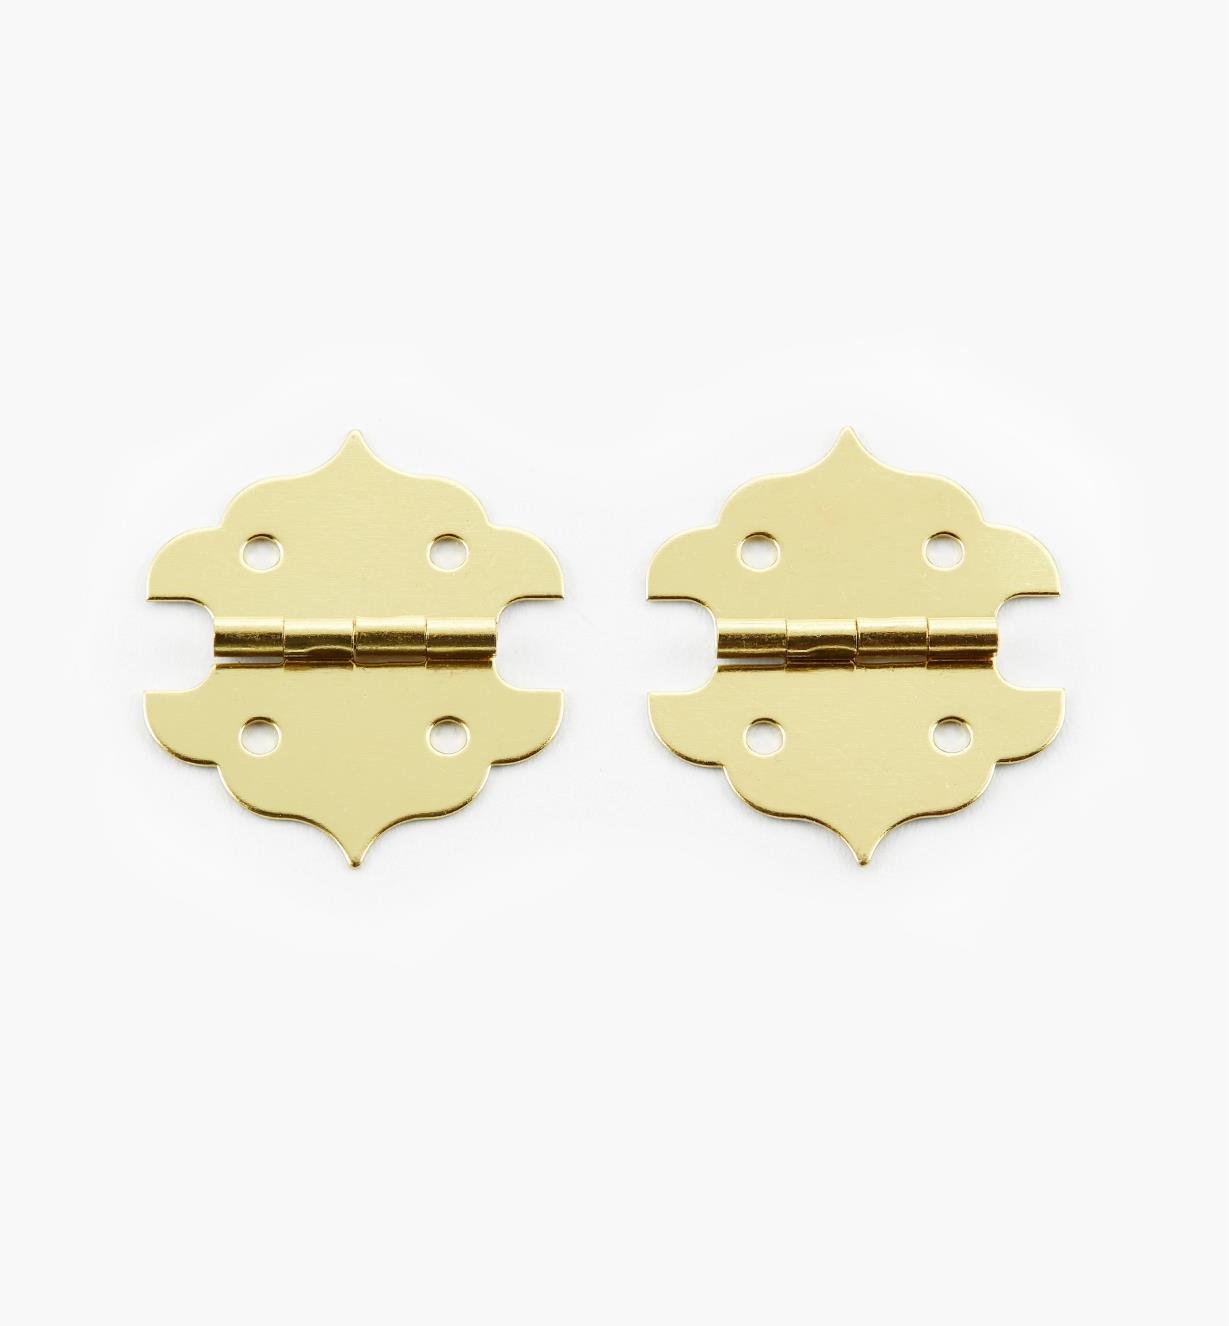 00D8040 - Wide Brass Hinges, pr.